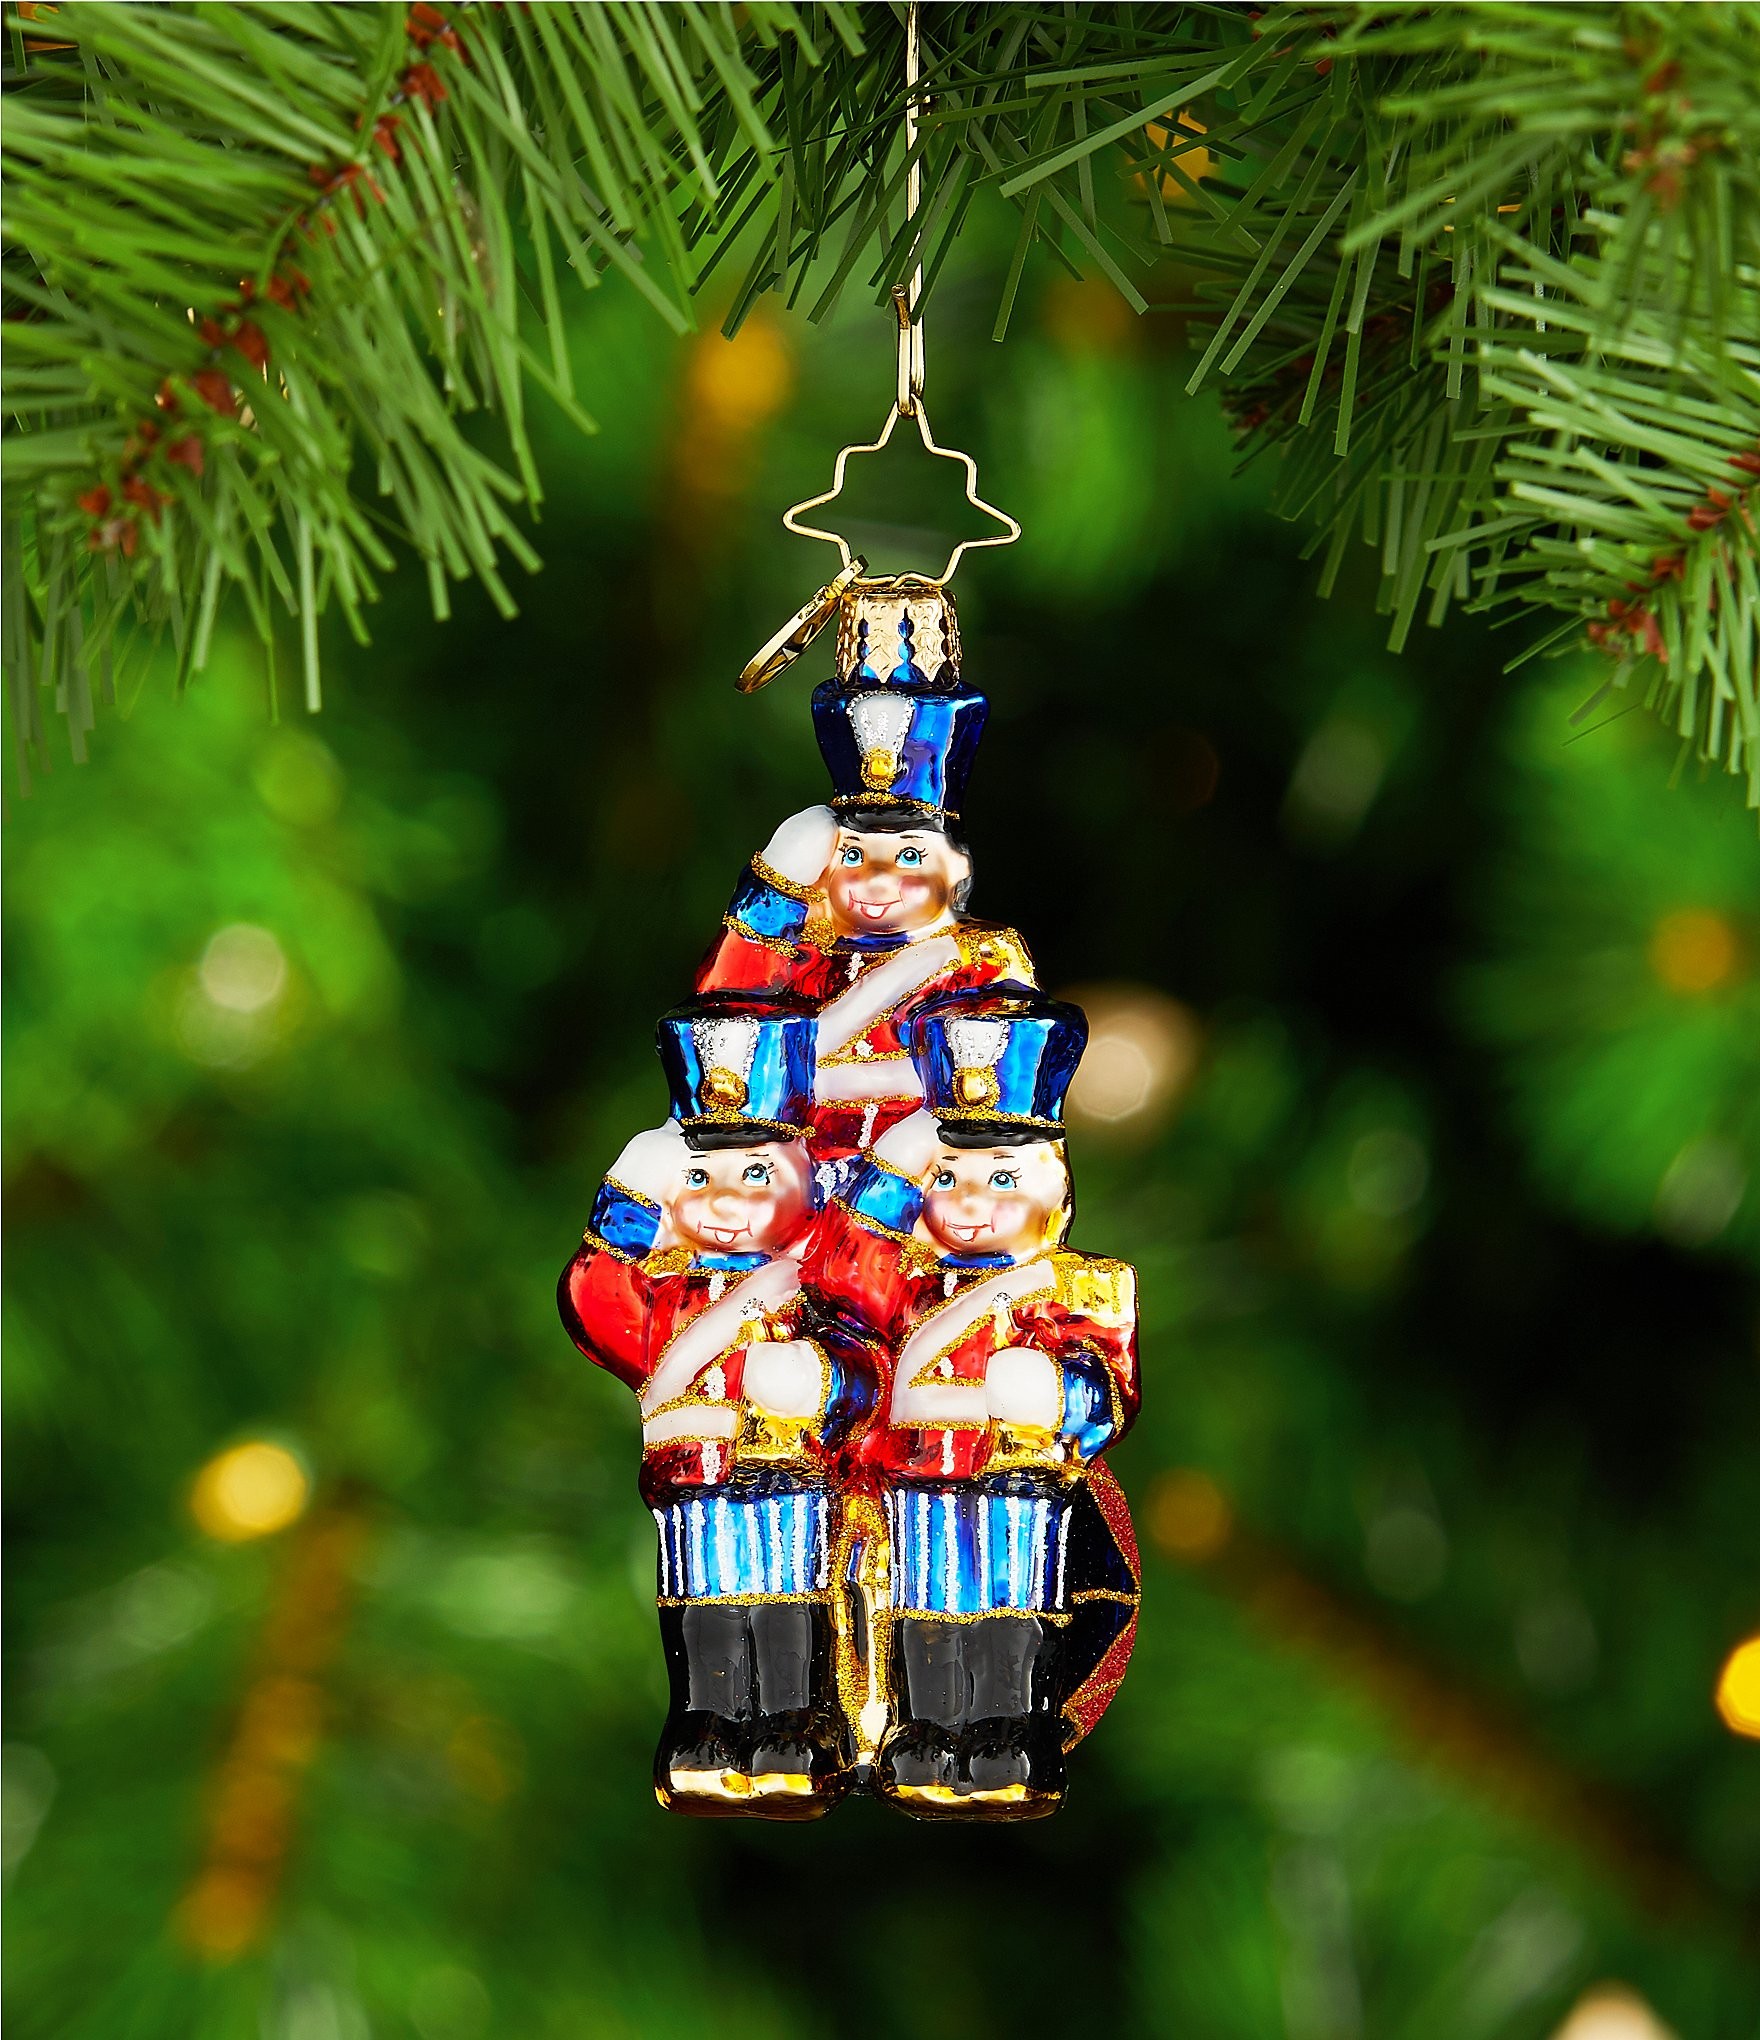 Dillards Christmas Decorations 2017 Psoriasisguru Com